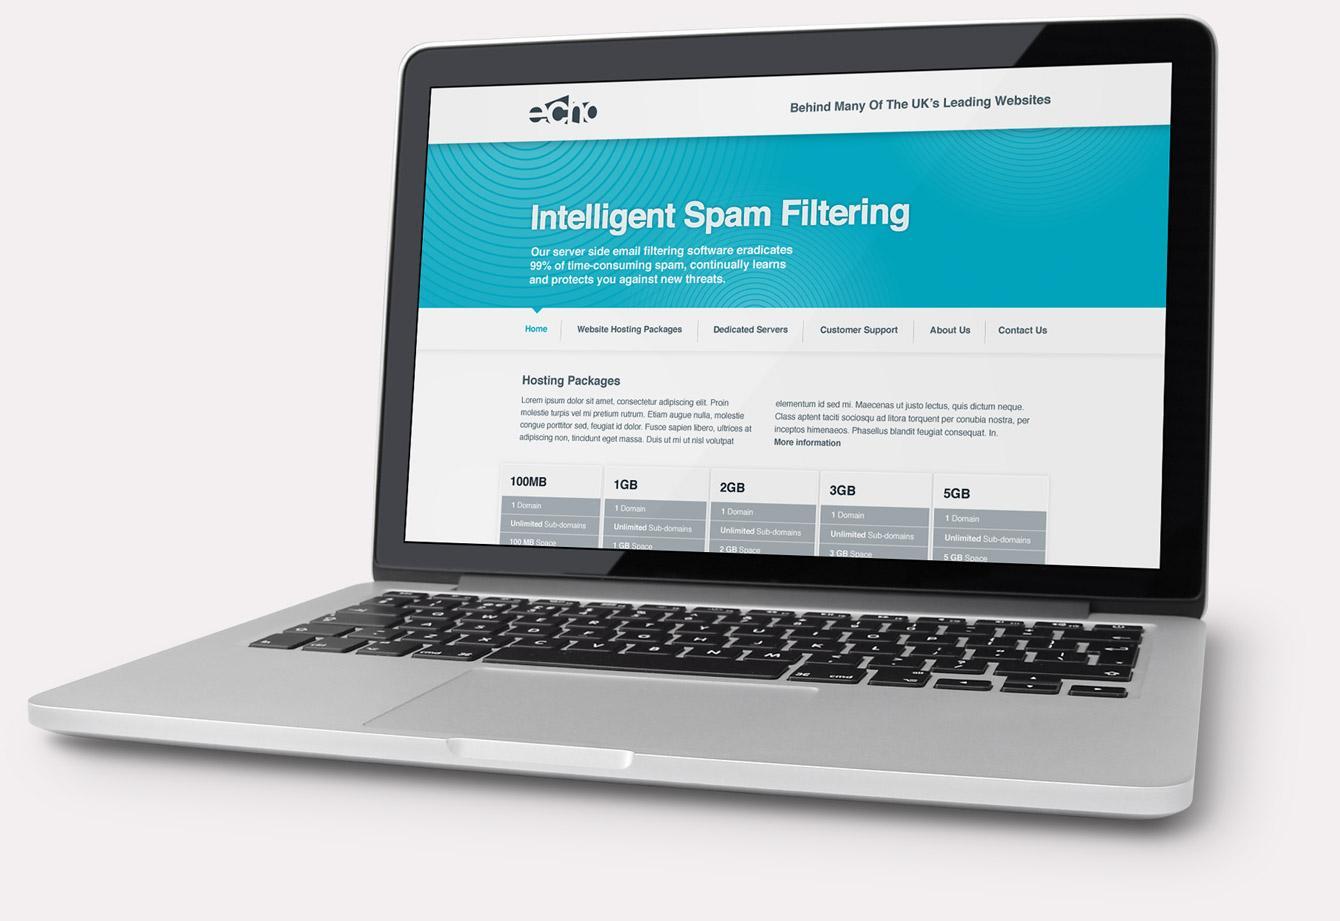 Echo website displayed on laptop